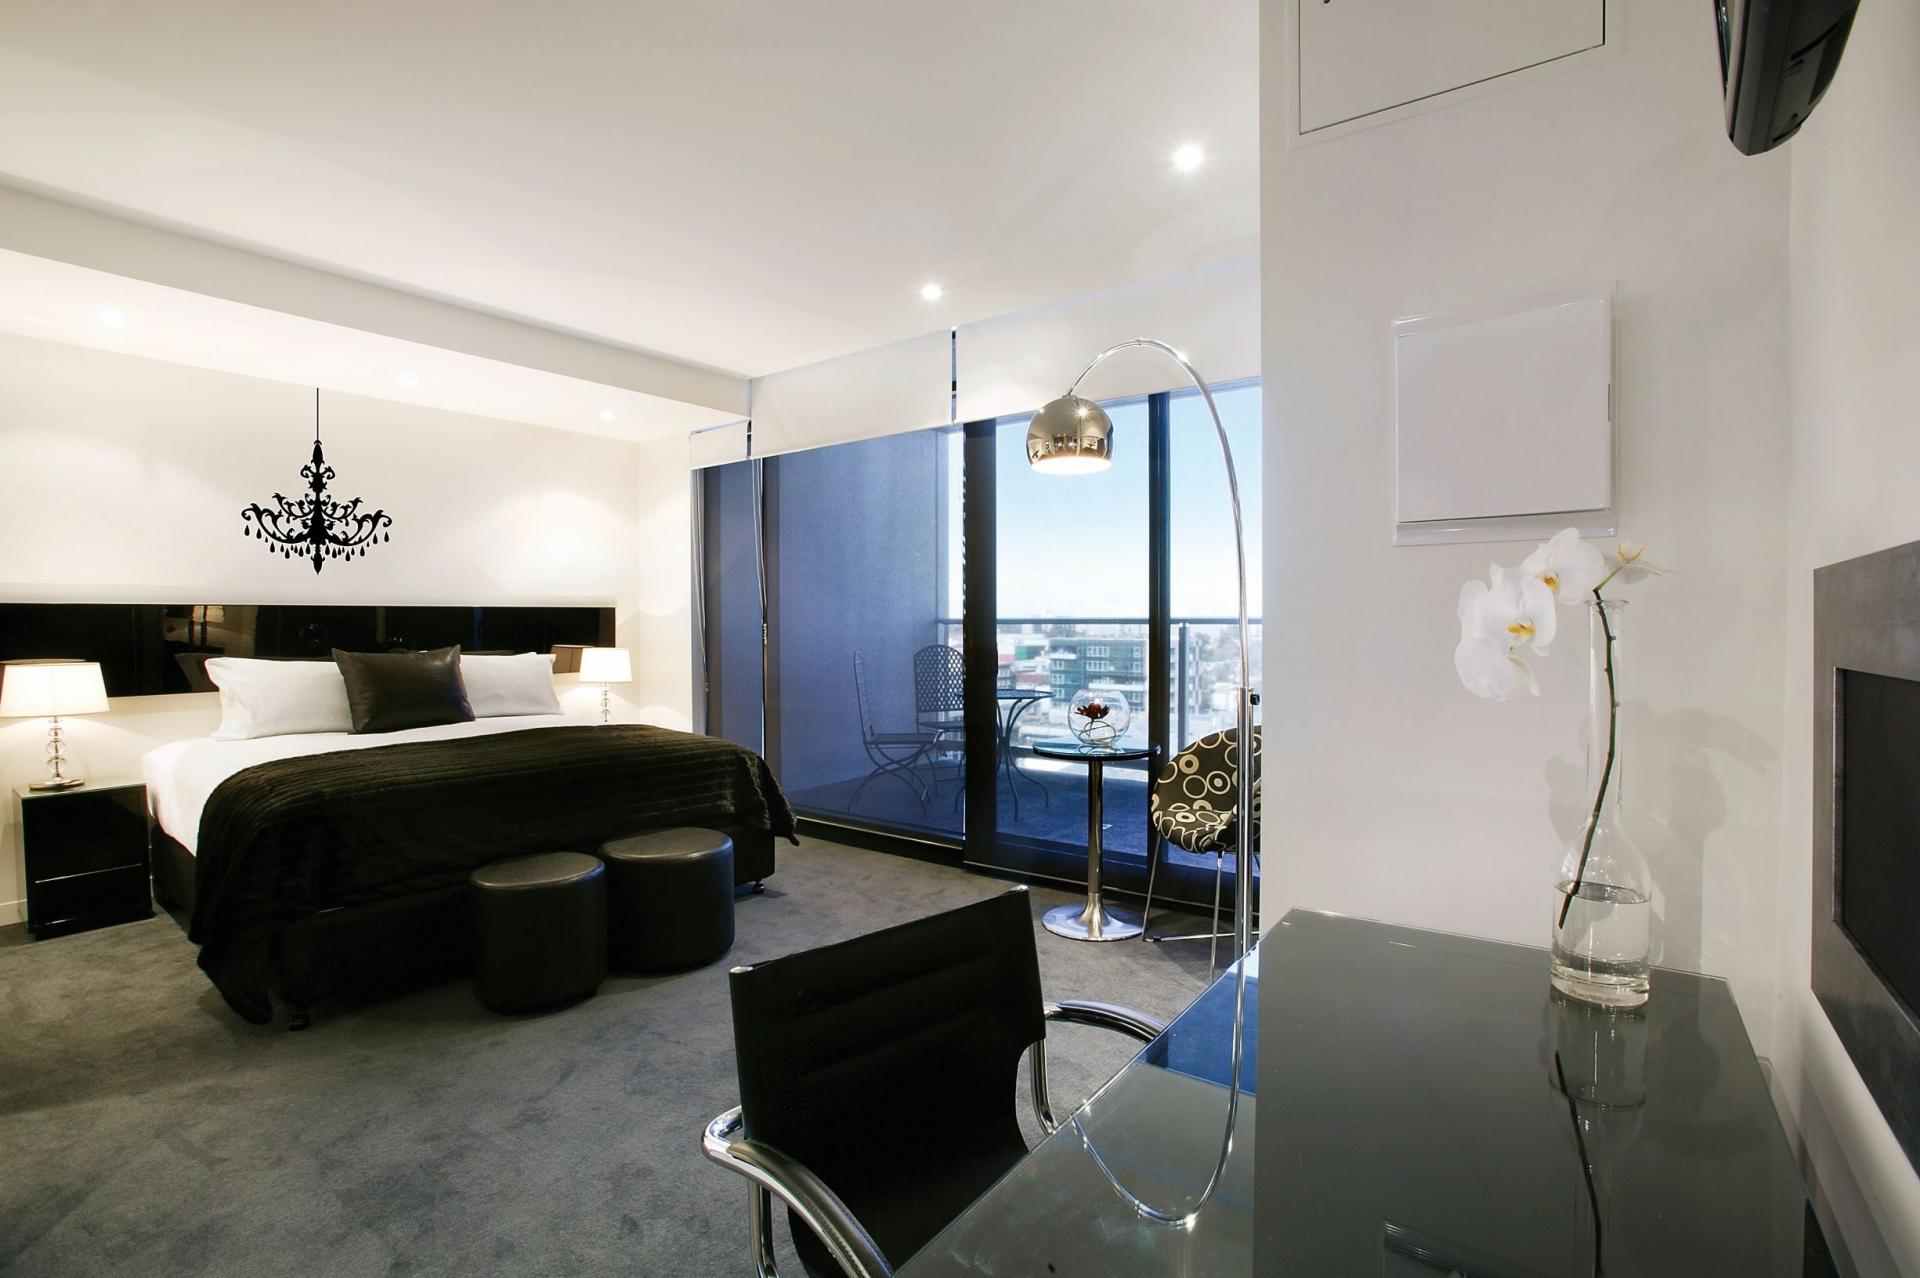 Bedroom at South Yarra Grand Apartments